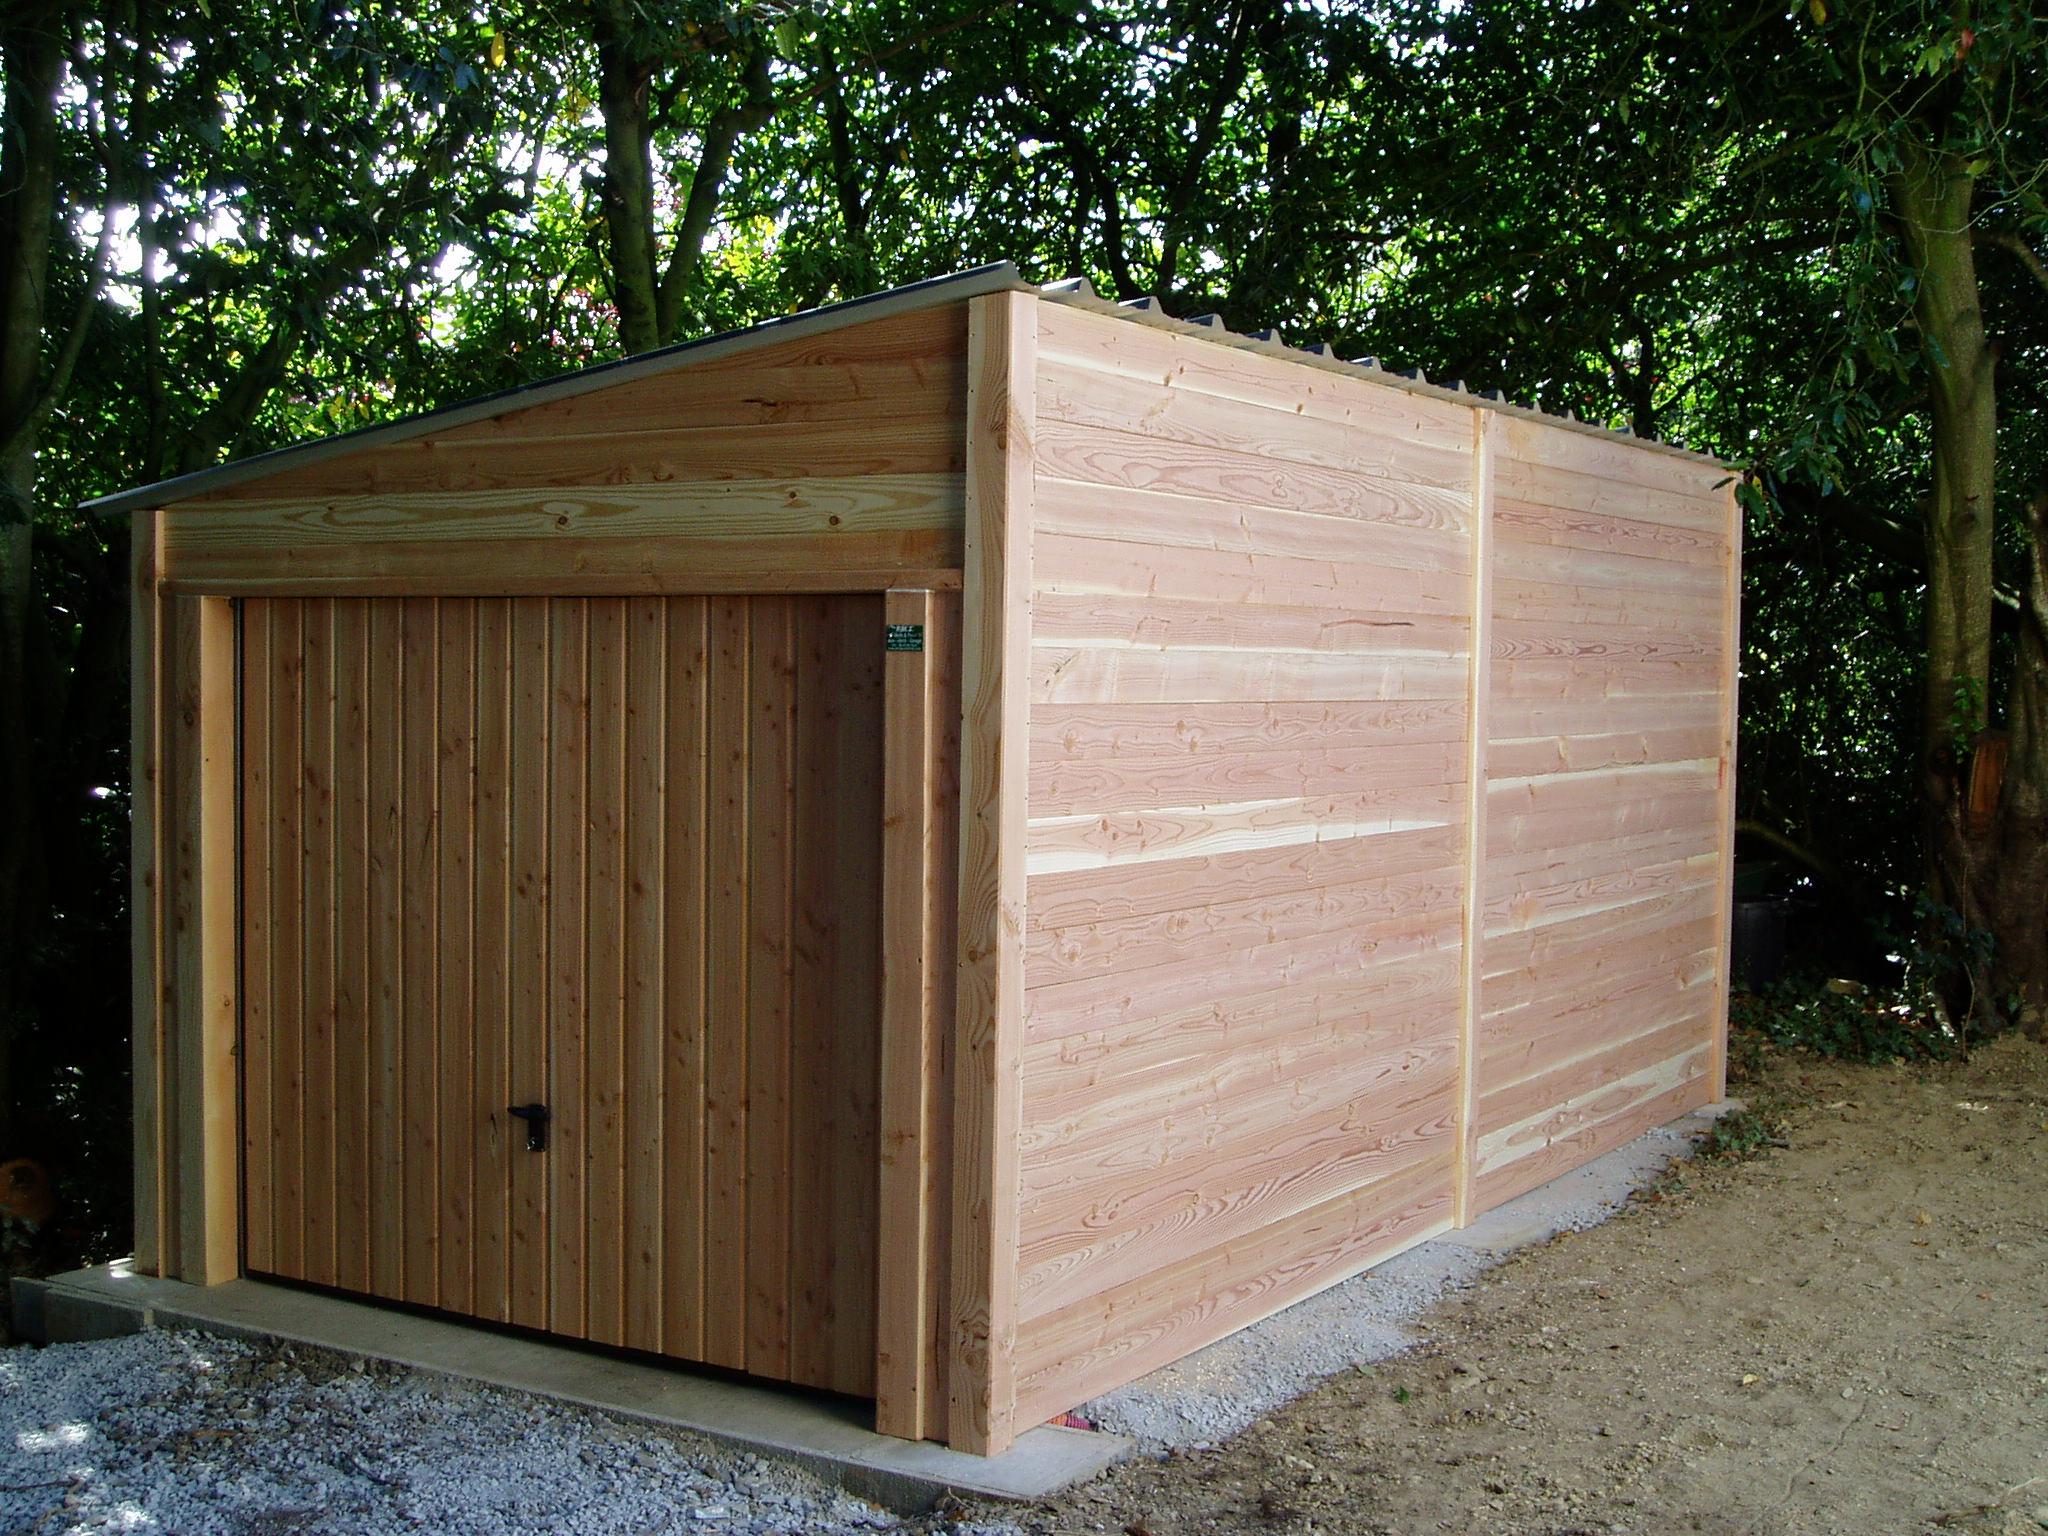 Garage 6 X 3 - 1 Pente concernant Corpor Abri De Jardin En Kit